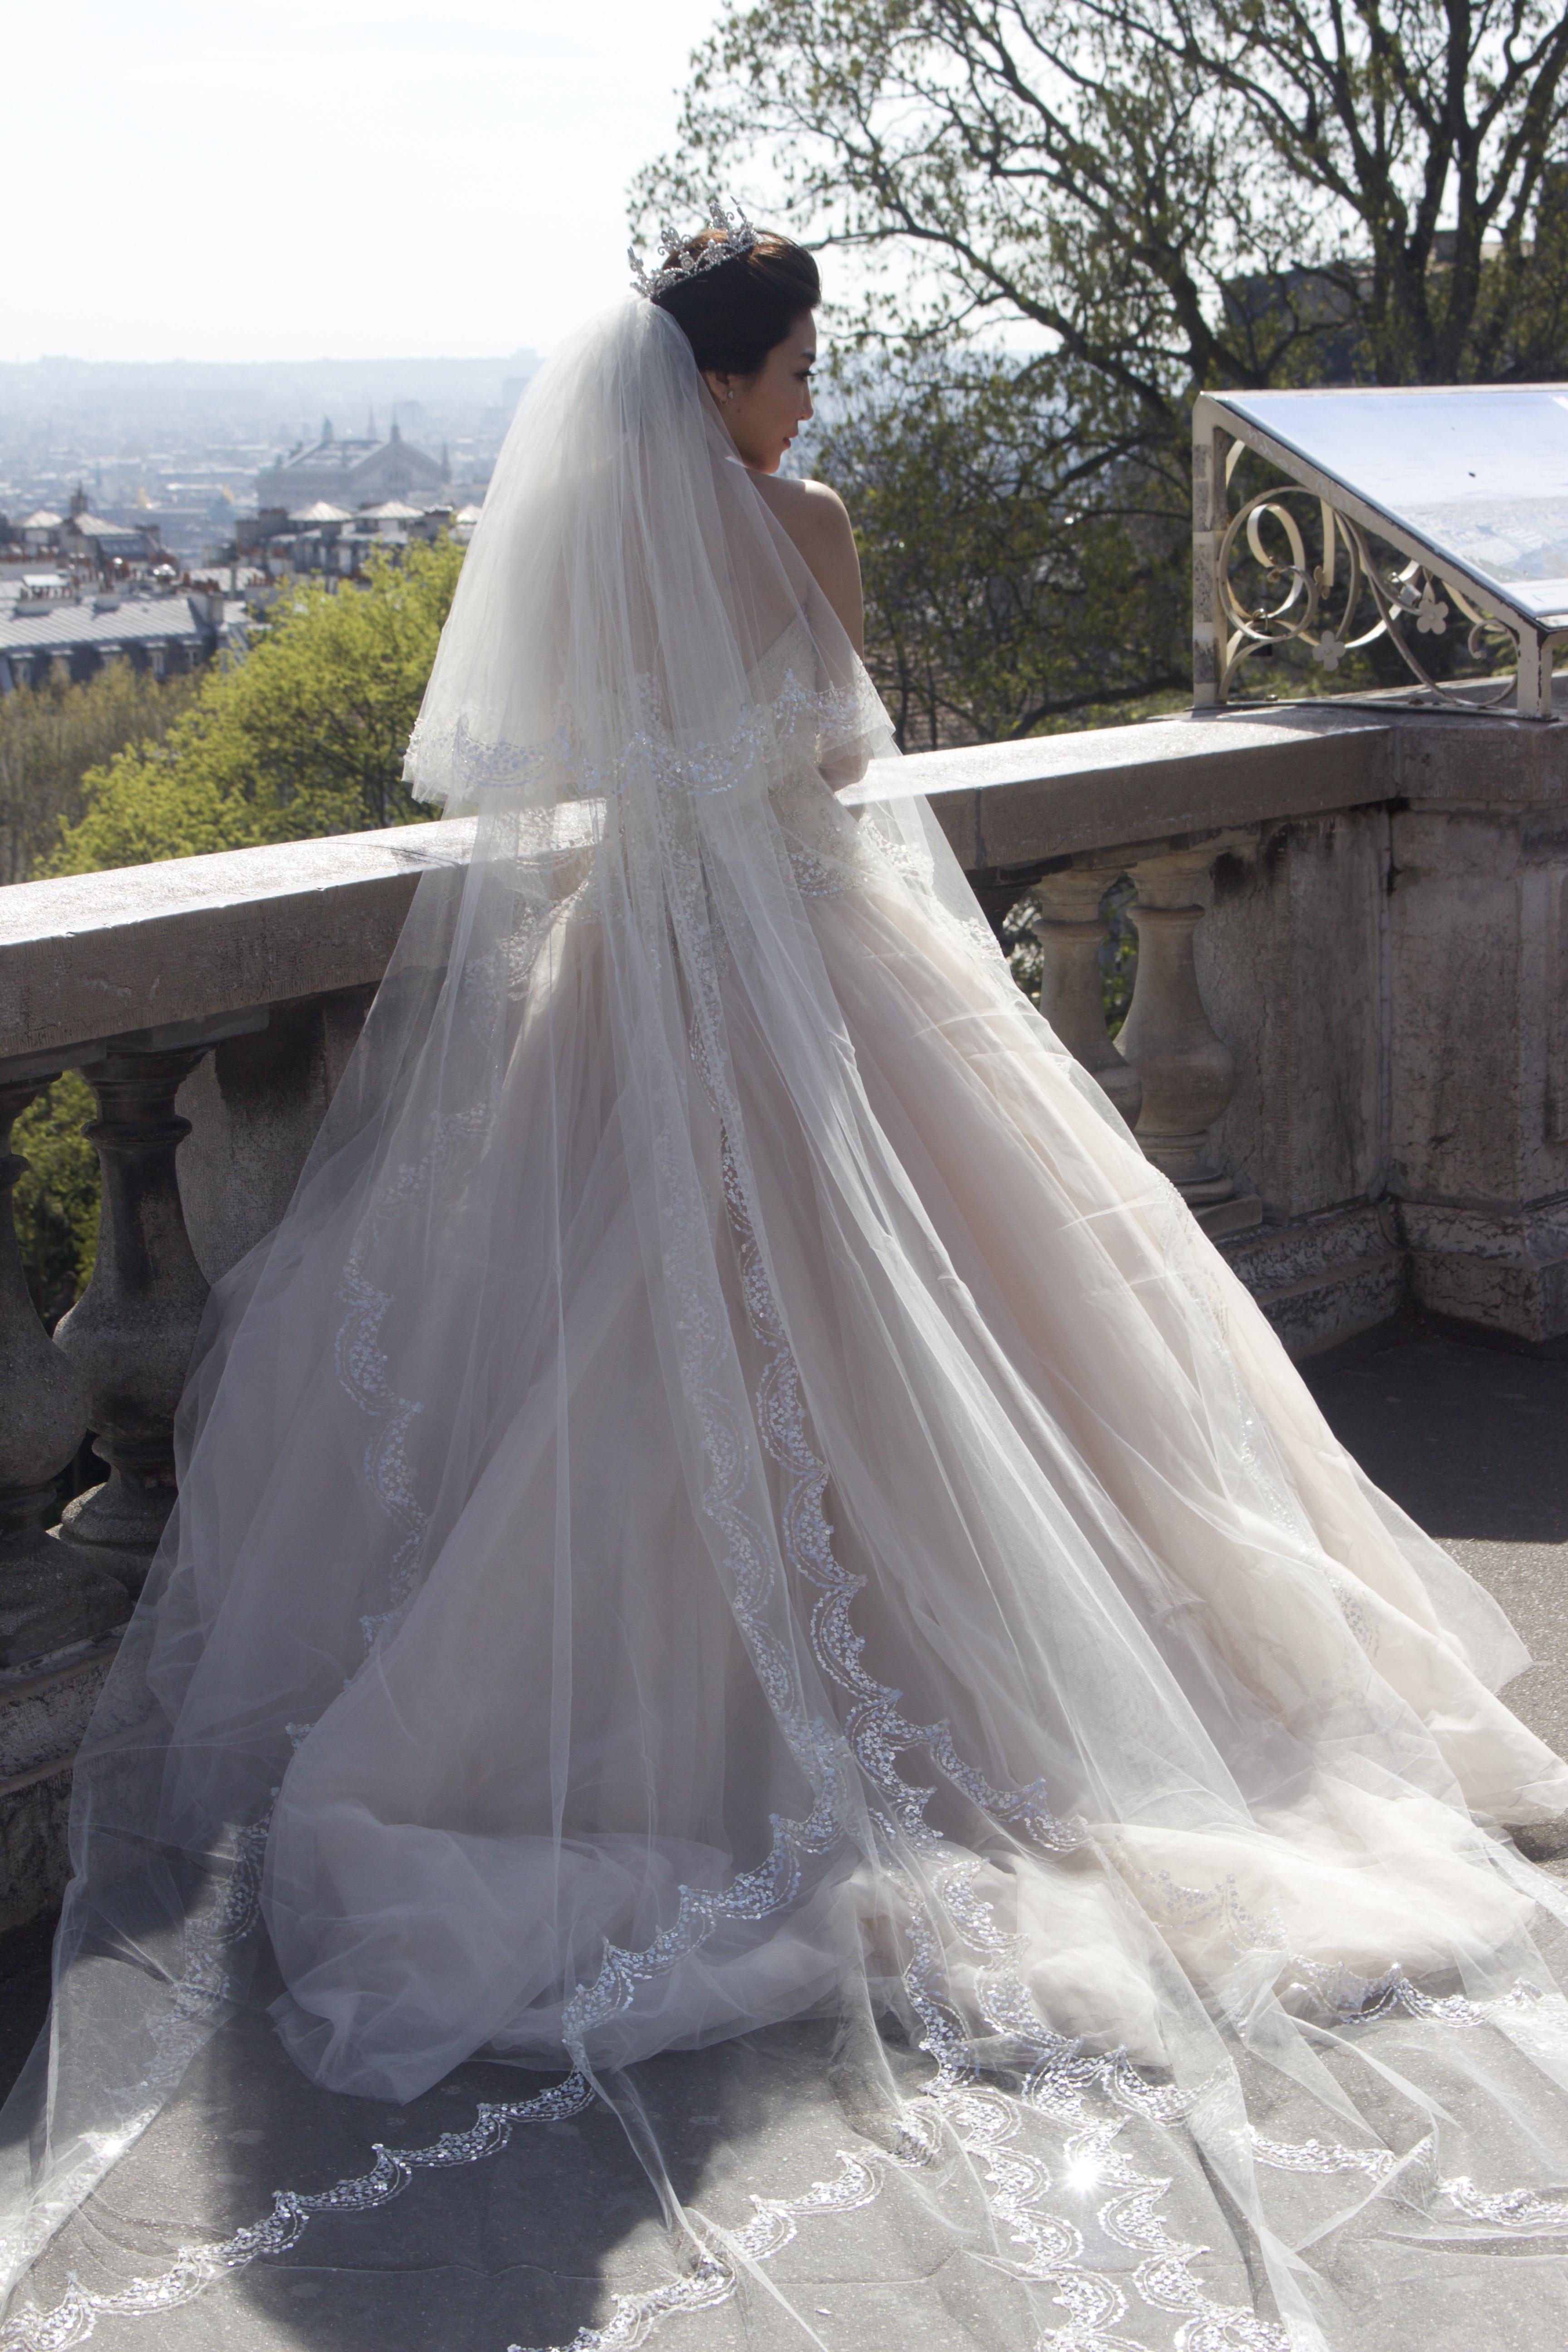 Gambar Paris Perancis Cinta Pernikahan Gaun Pengantin